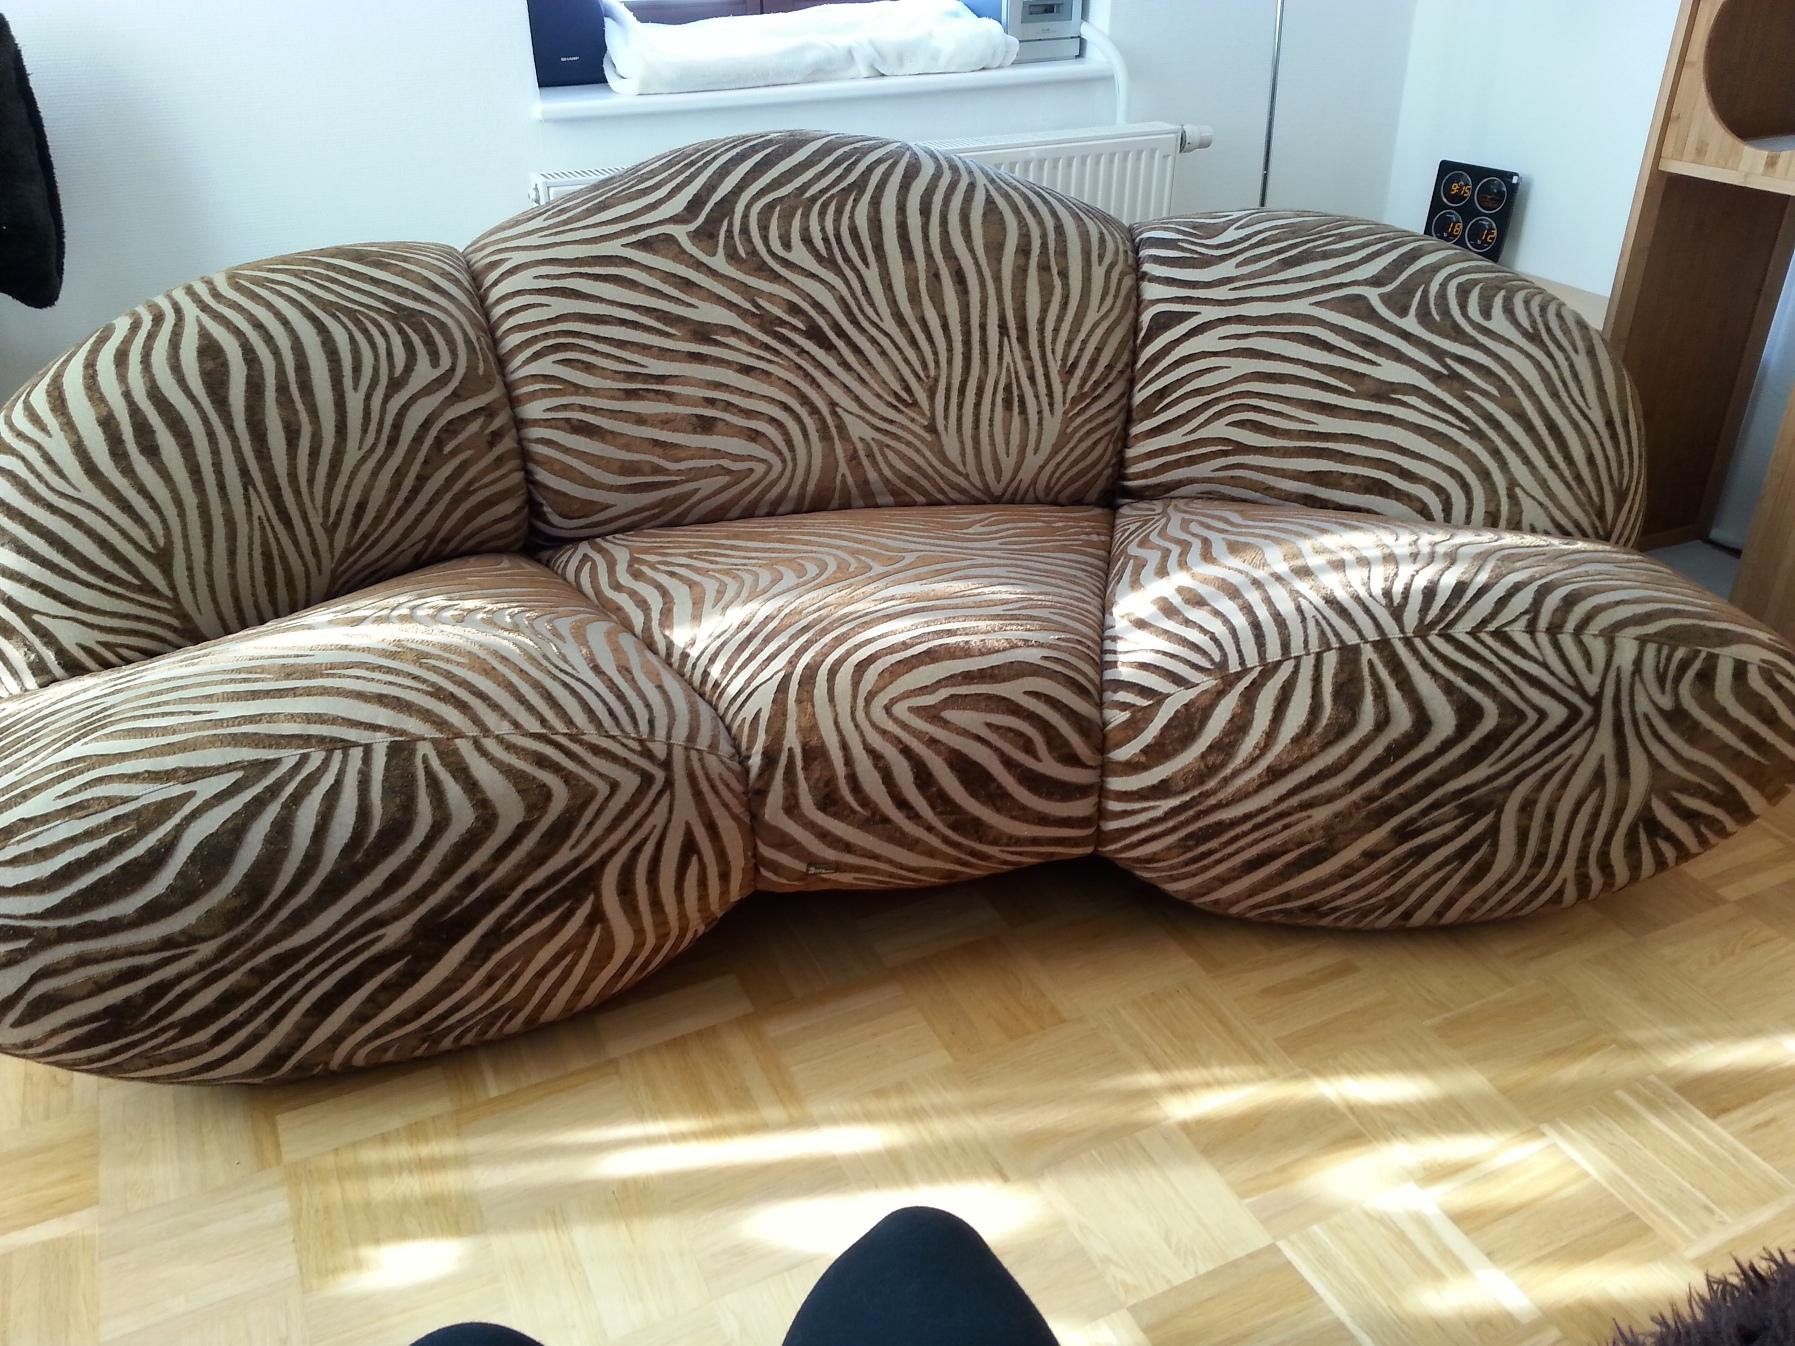 original bretz designer sofa cultsofa 75x205x100 cm couch. Black Bedroom Furniture Sets. Home Design Ideas